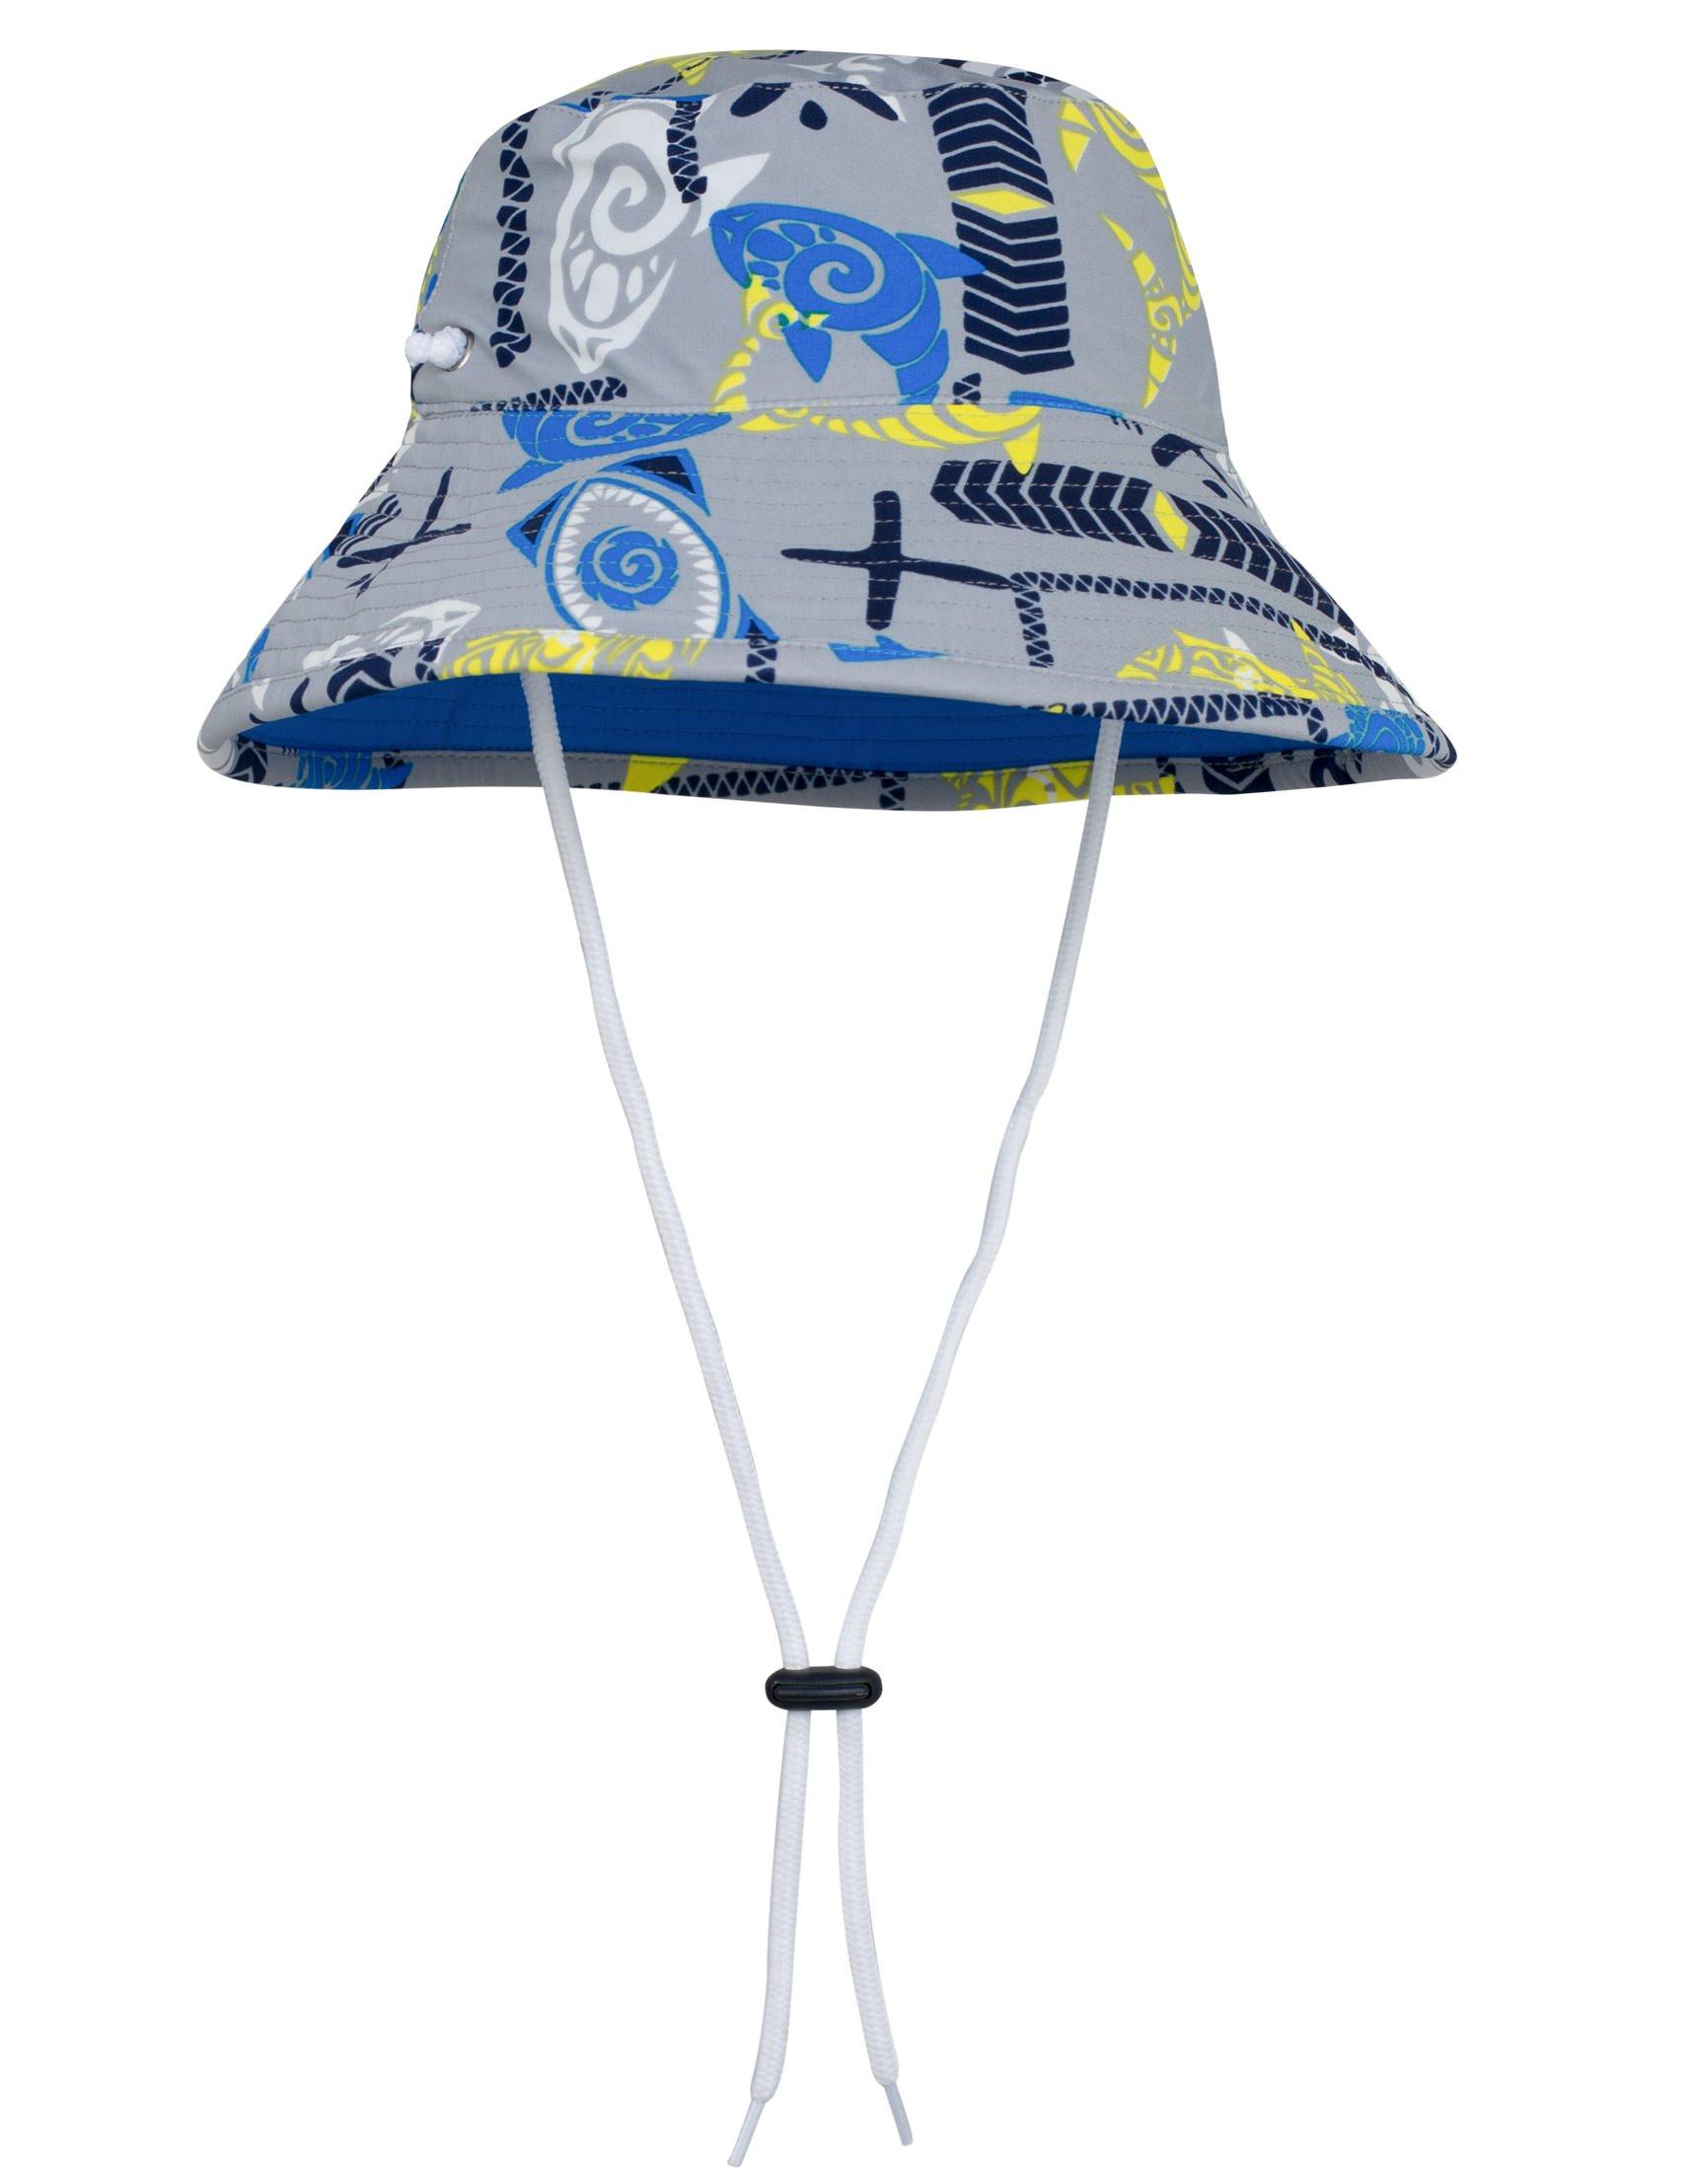 Tuga Boys Bucket Hat (UPF 50+), Fanatic, Large